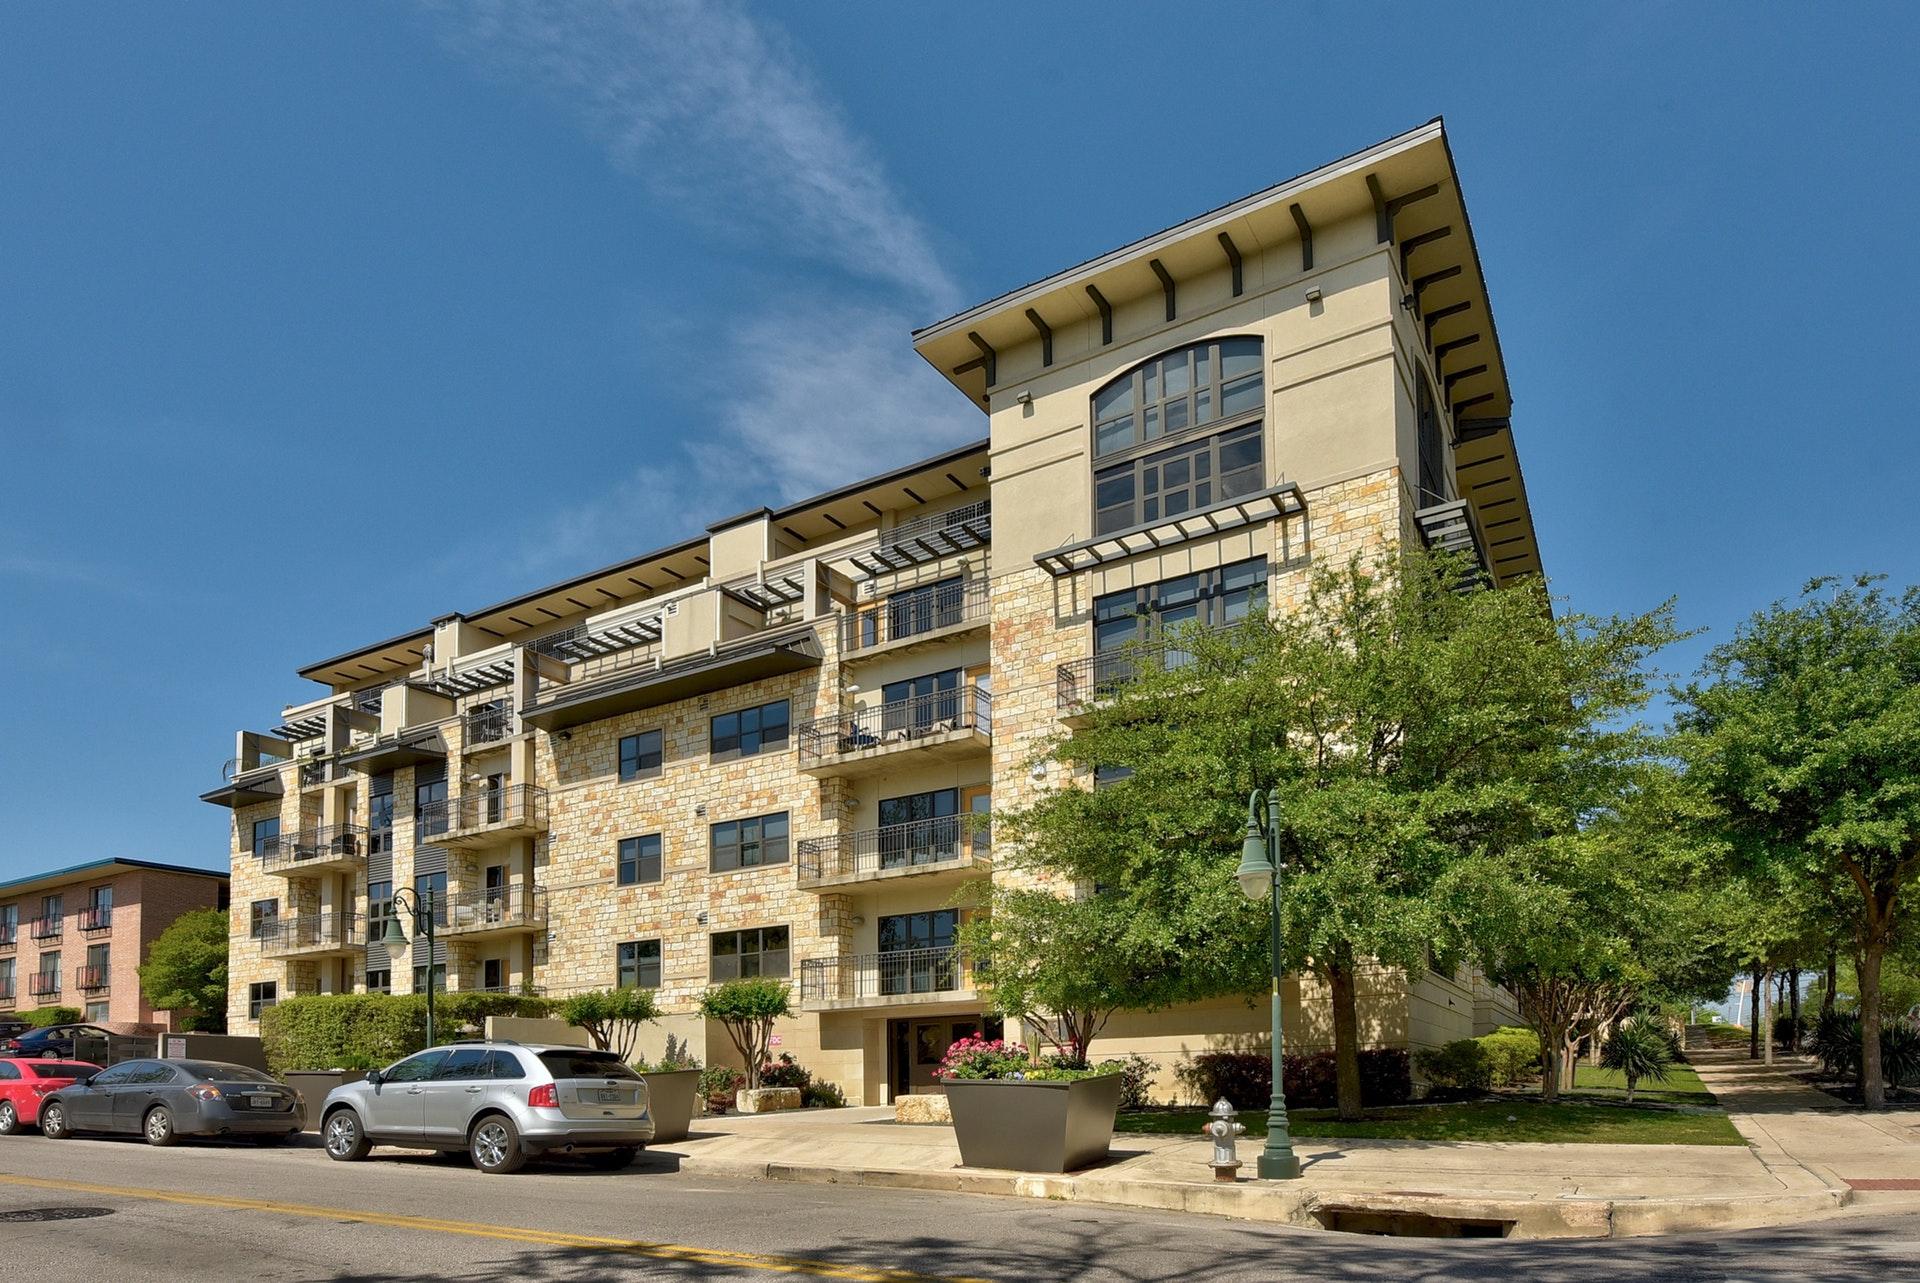 1812 West #306 - Building View